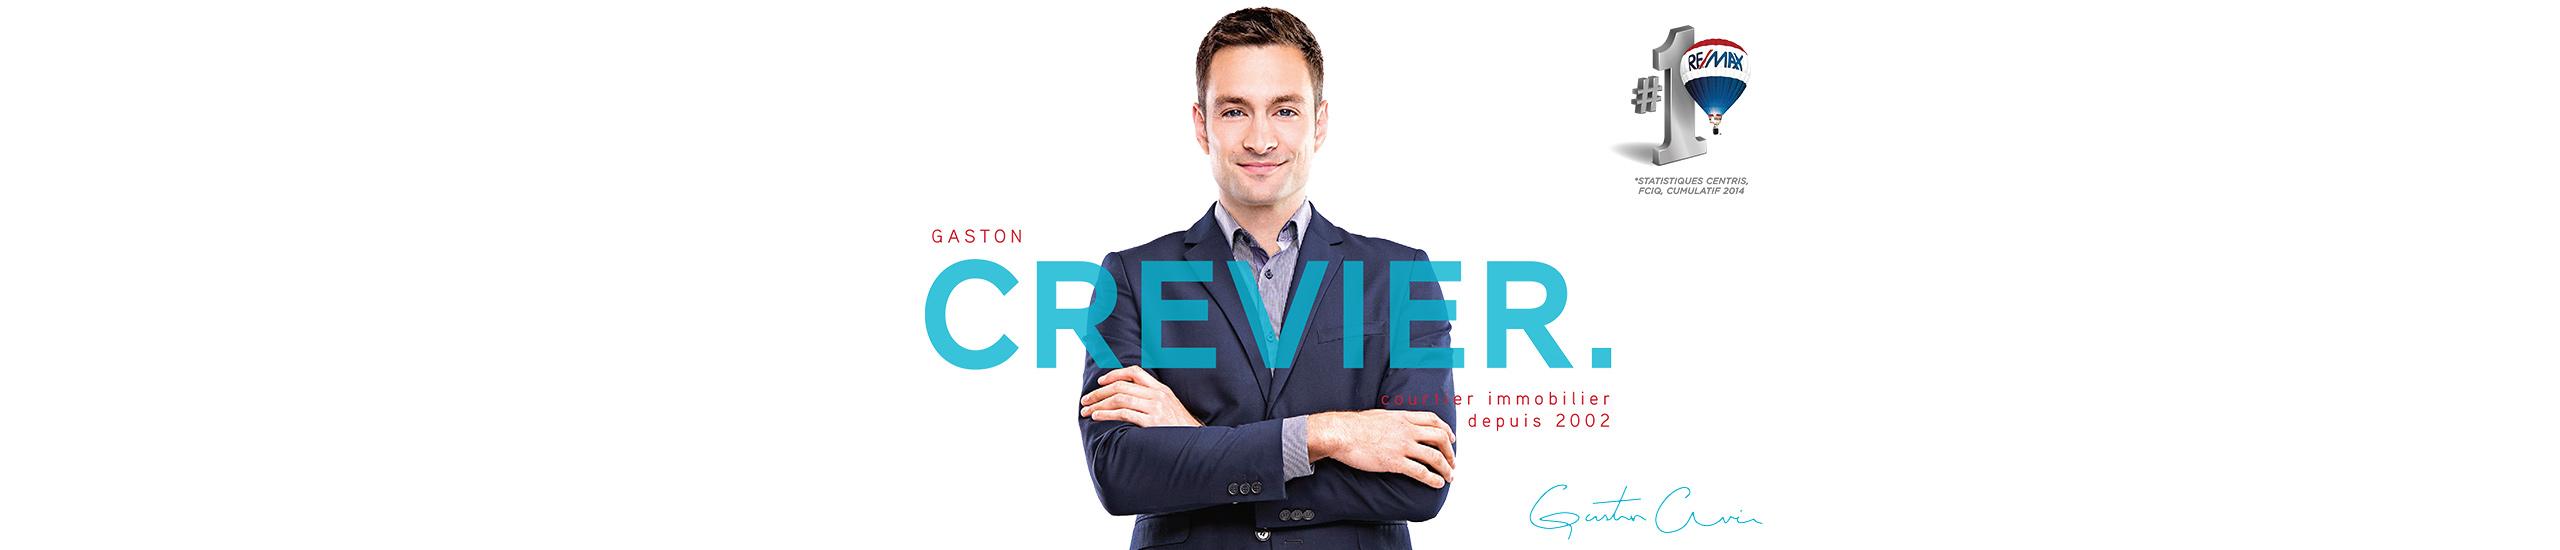 GASTON CREVIER-BÉLANGER   RE/MAX